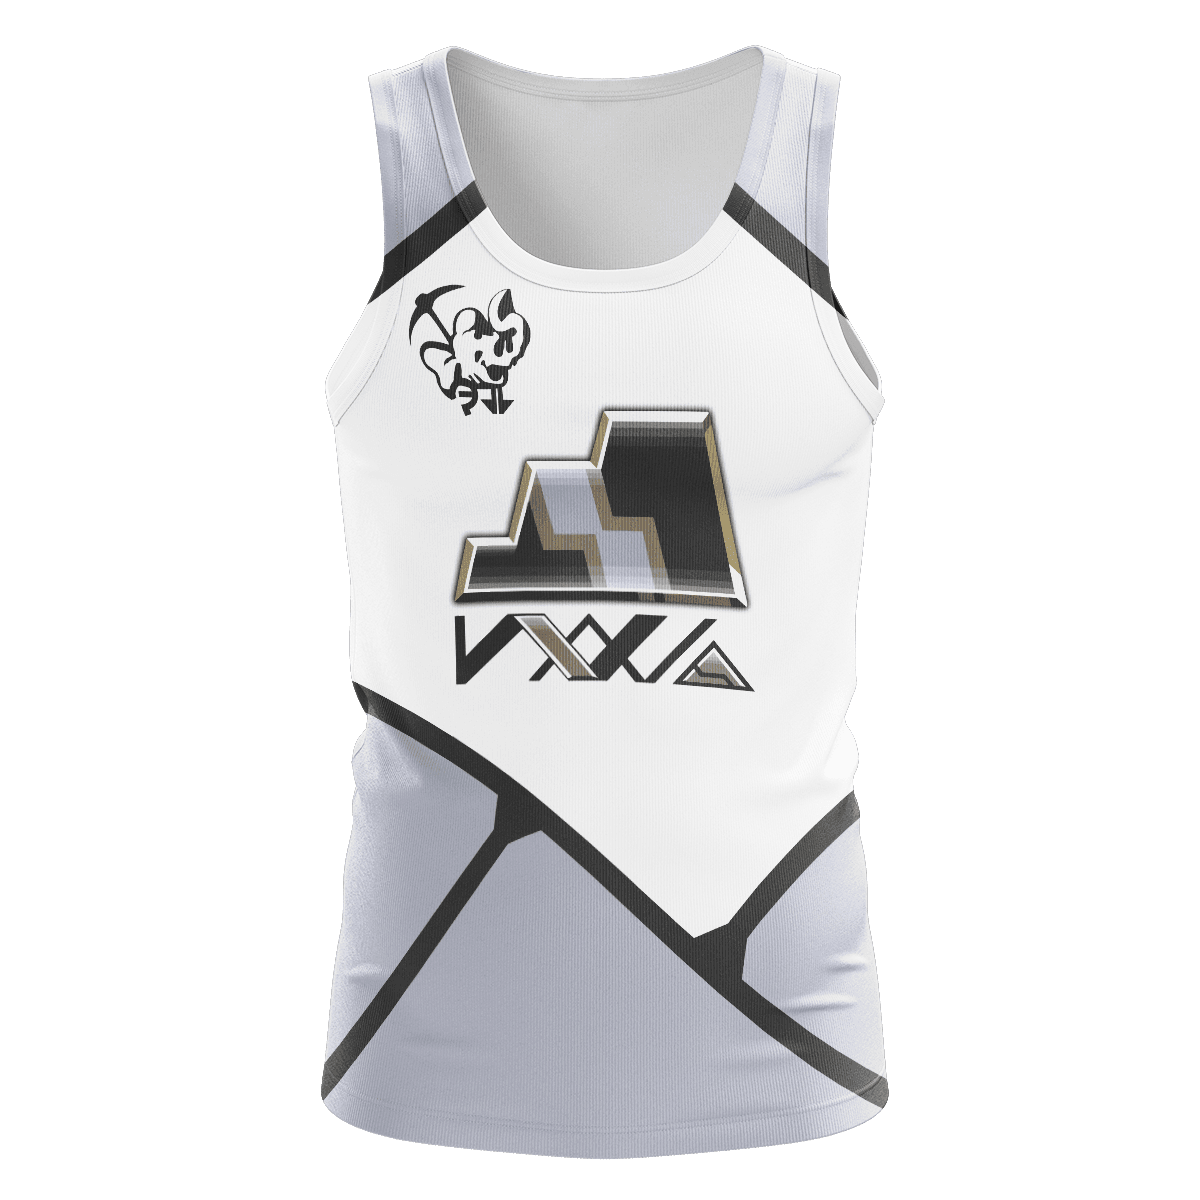 Pokemon Rock Uniform Unisex Tank Tops FDM3107 S Official Anime Swimsuit Merch